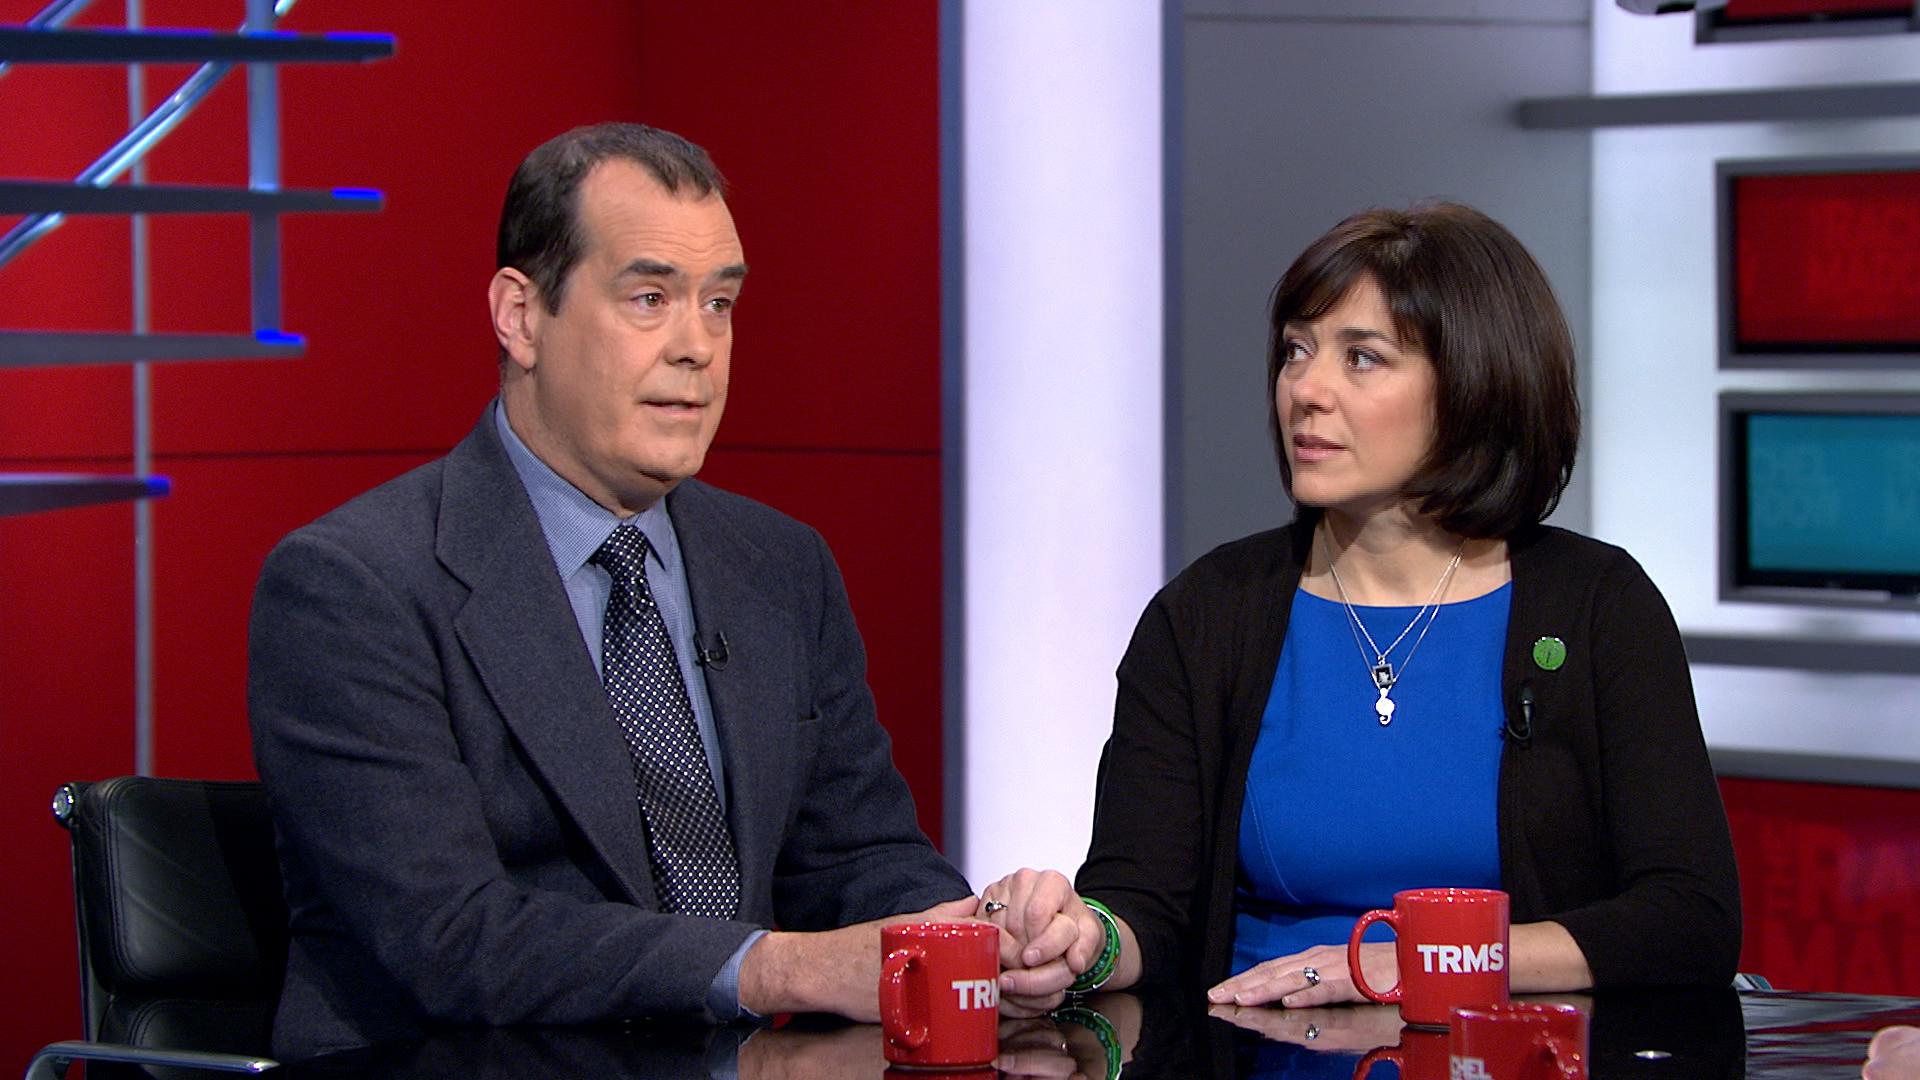 Sandy Hook parents strive to 'be loving'